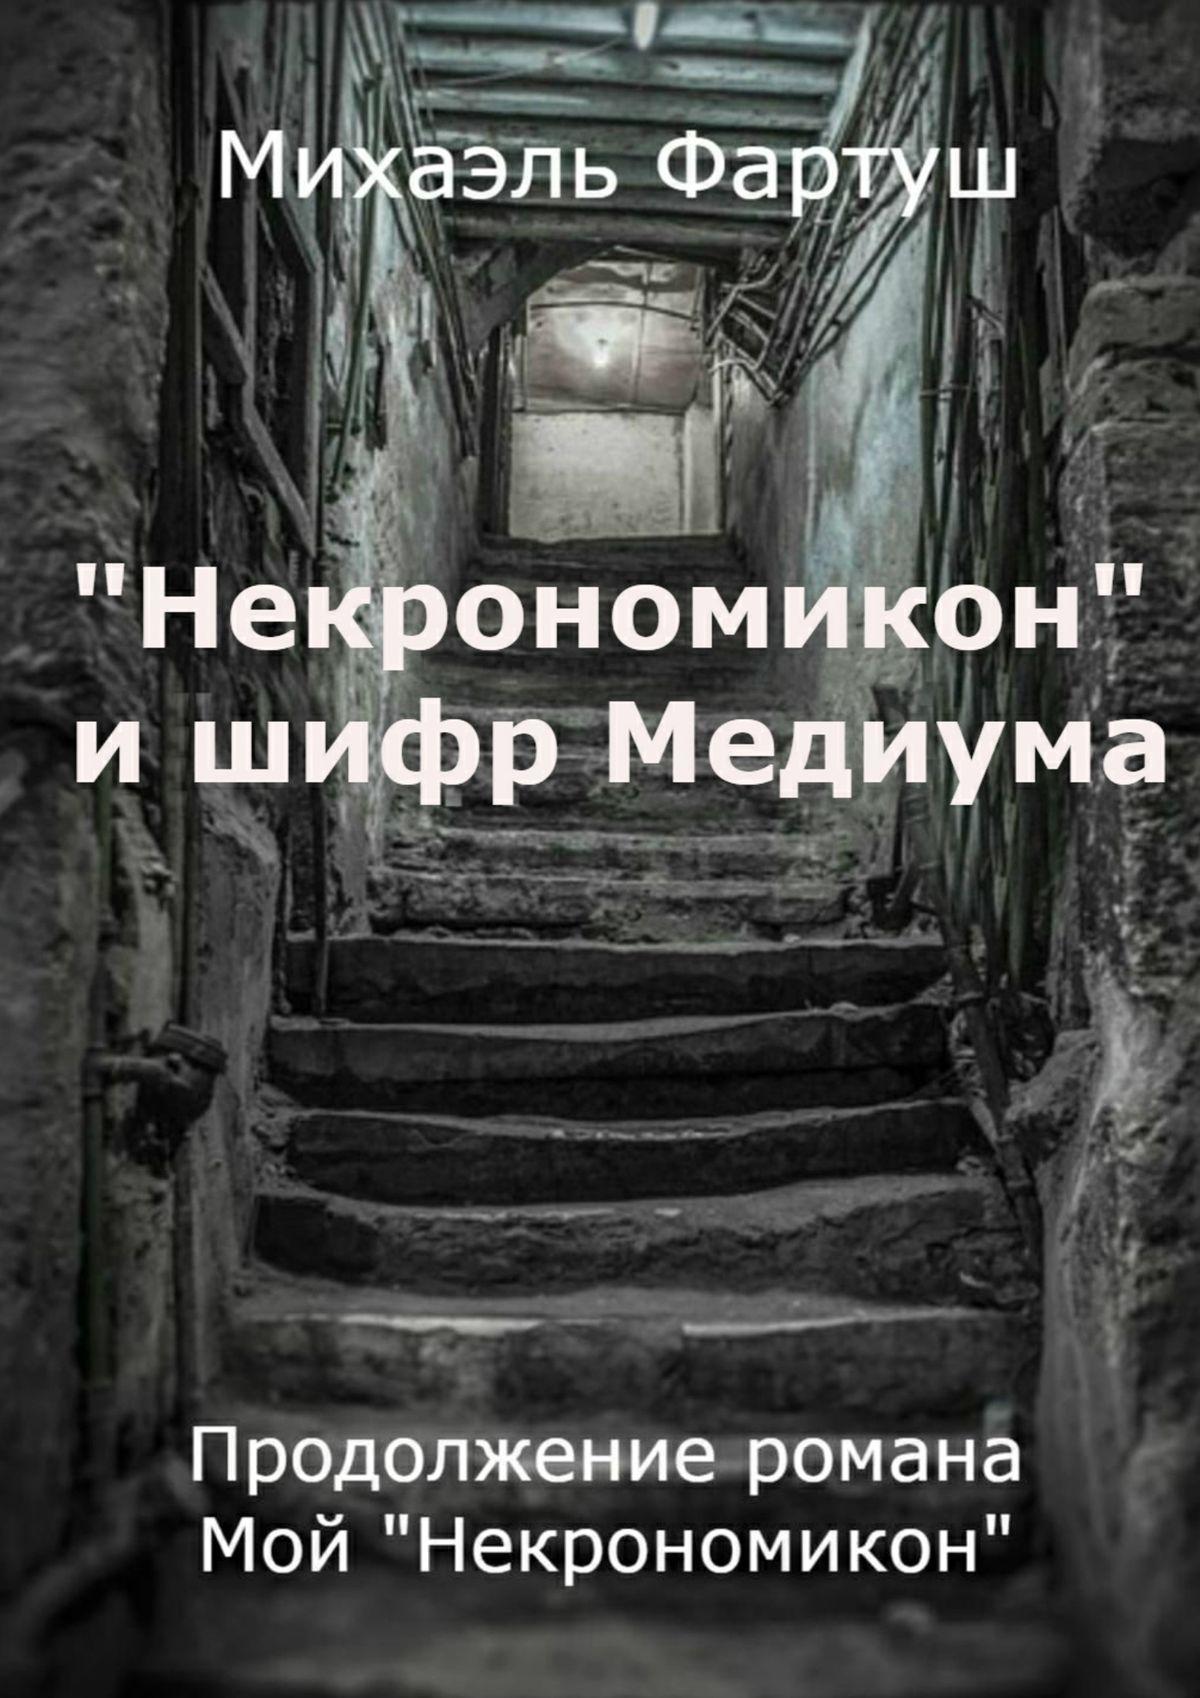 Михаэль Фартуш «Некрономикон» и шифр Медиума